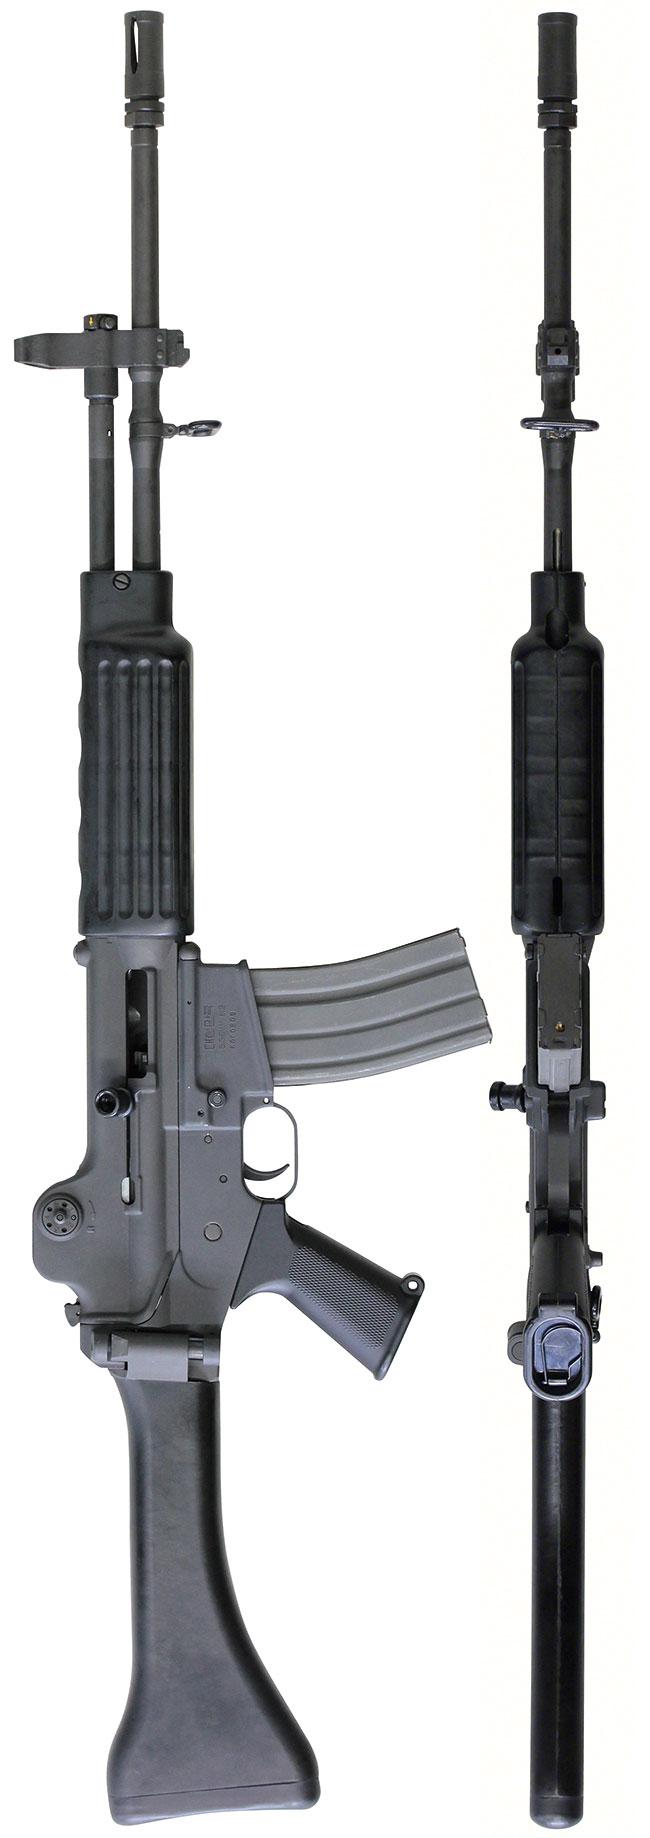 【3815】K2-自動小銃-(#K000809)右.jpg